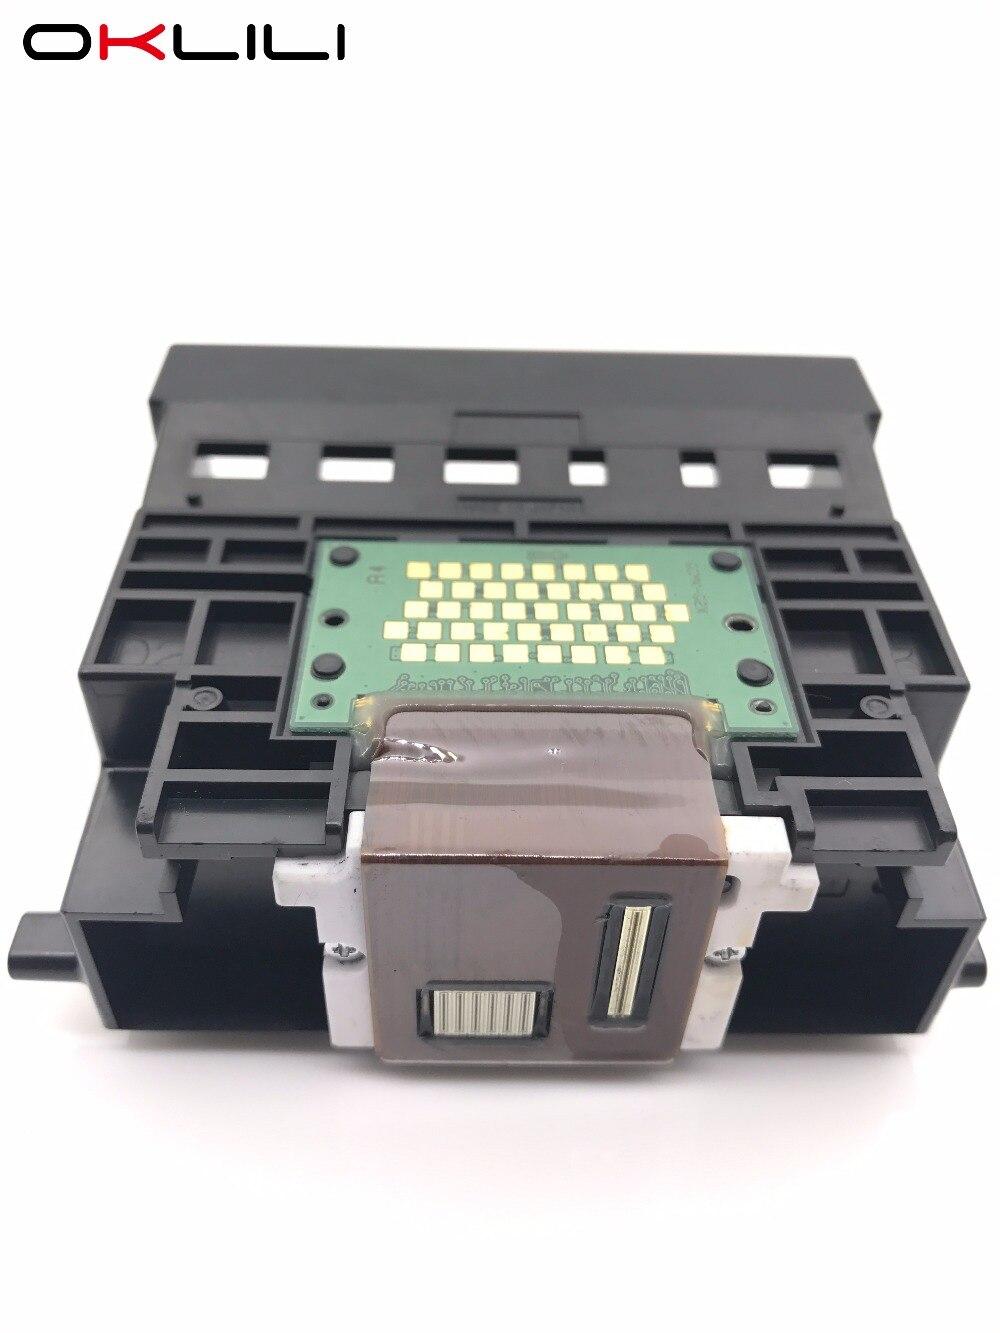 OKLILI QY6-0049 cabezal de impresión de la cabeza de la impresora Canon 860i 865 i860 i865 MP770 MP790 iP4000 iP4100 MP750 MP760 MP780